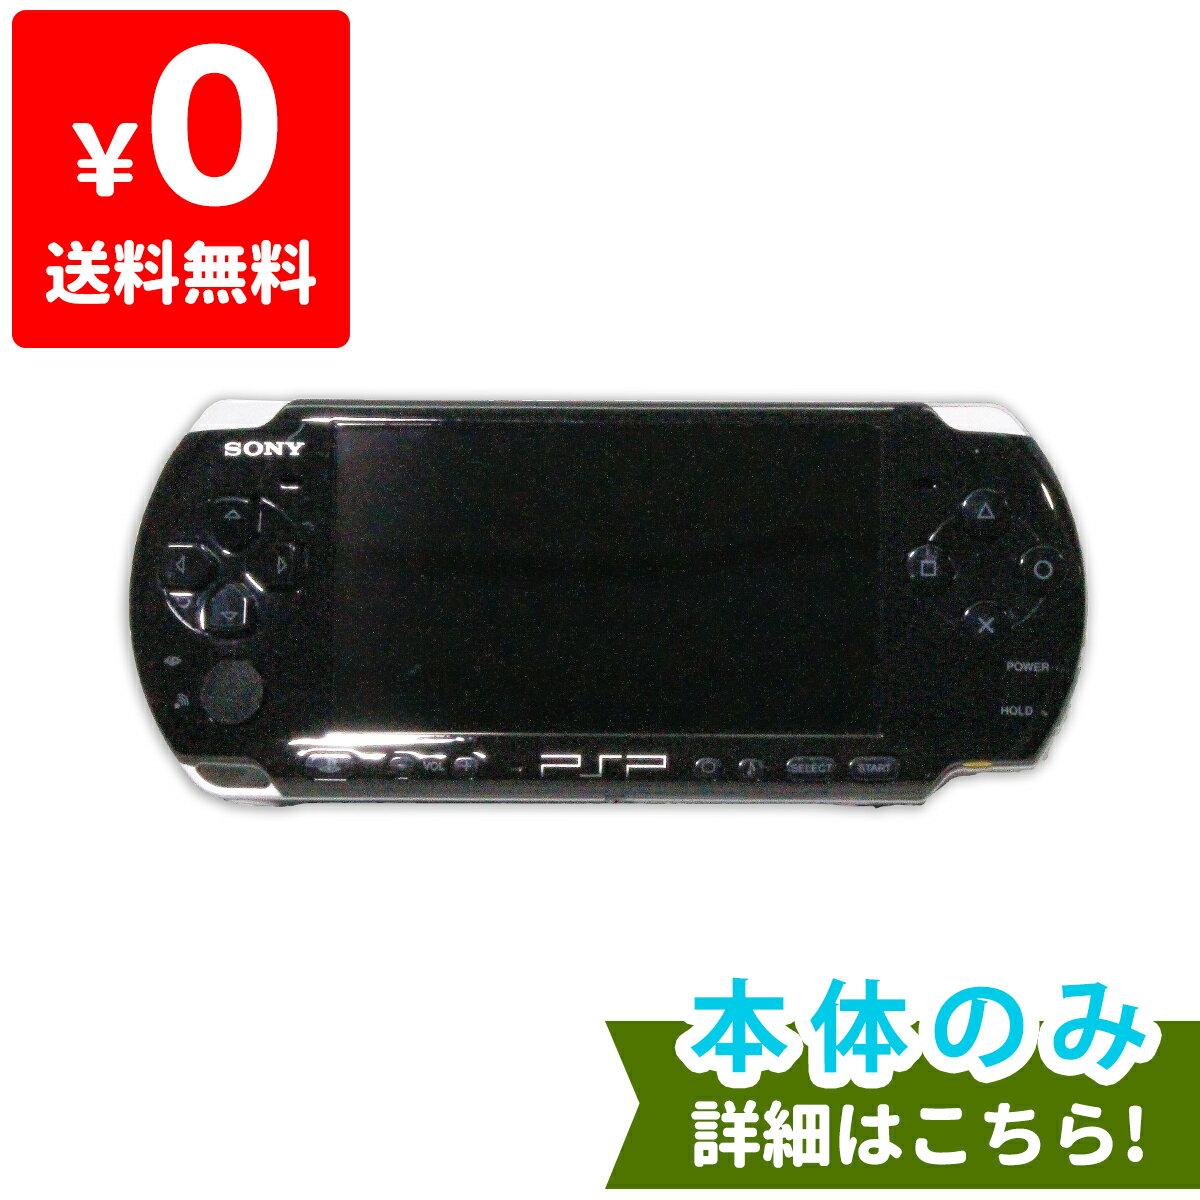 PSP 1000 PSP-1000 本体のみ PlayStationPortable SONY ソニー 中古 4948872410670 送料無料 【中古】